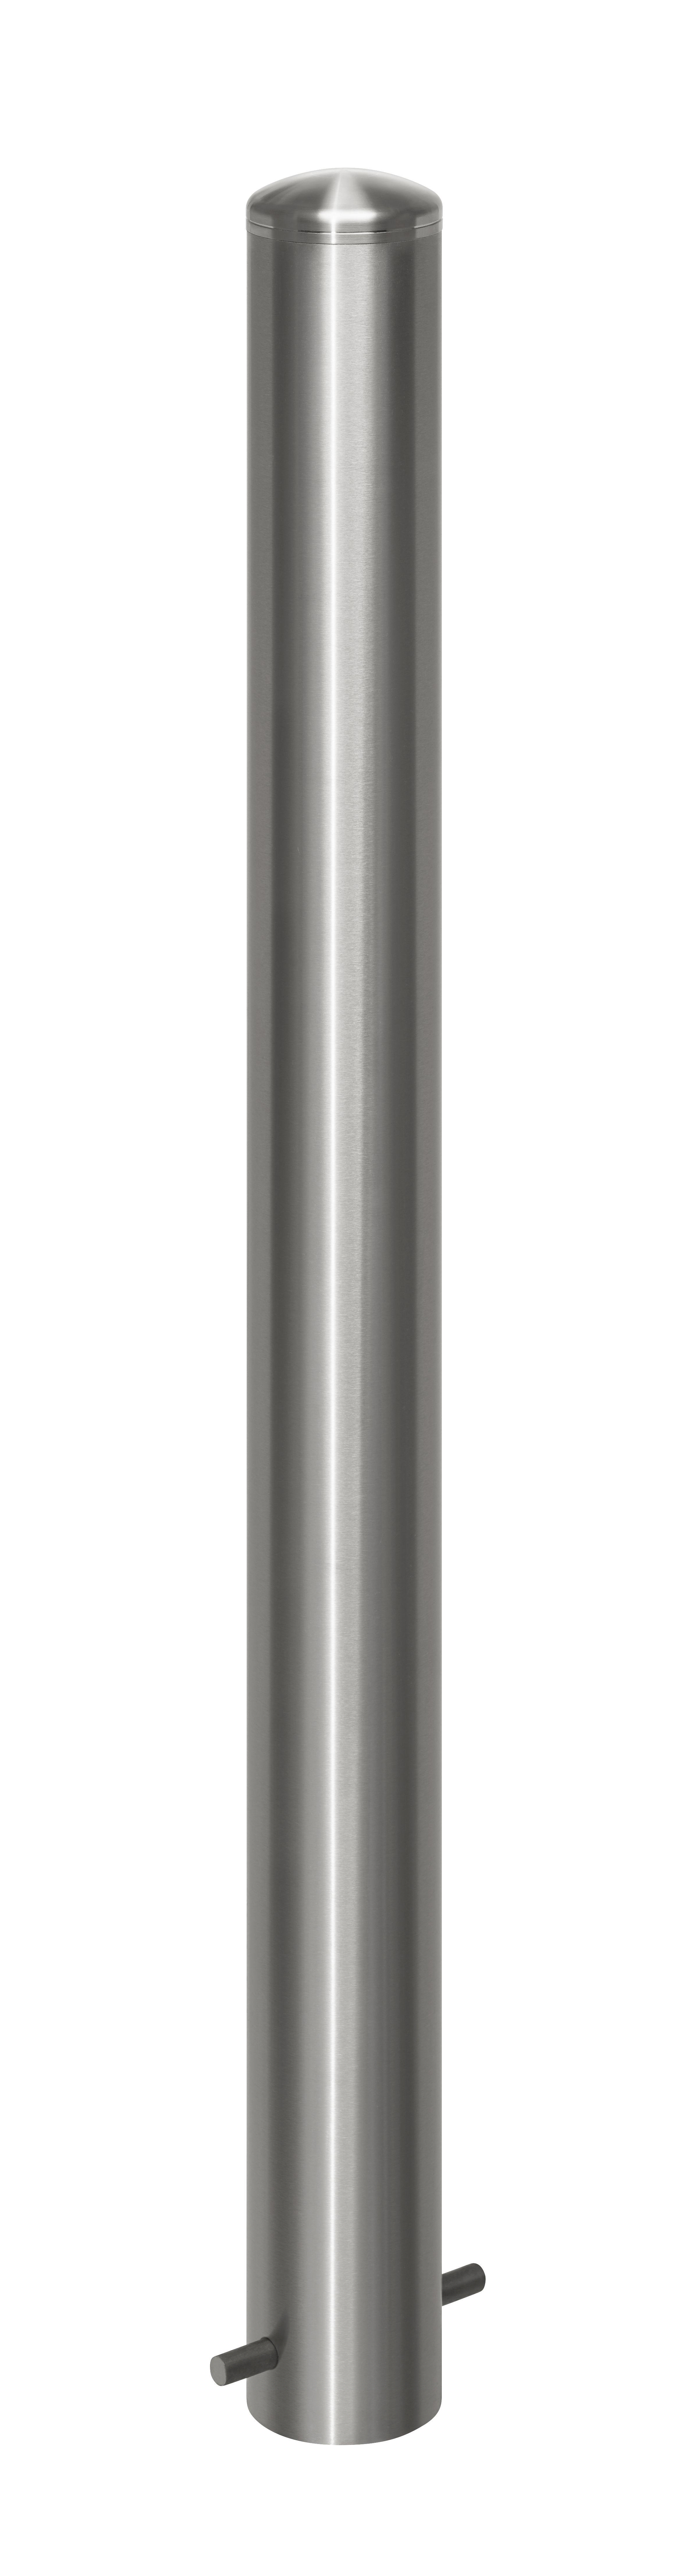 Absperrpfosten aus Edelstahl | Ø 102 mm x 900 mm